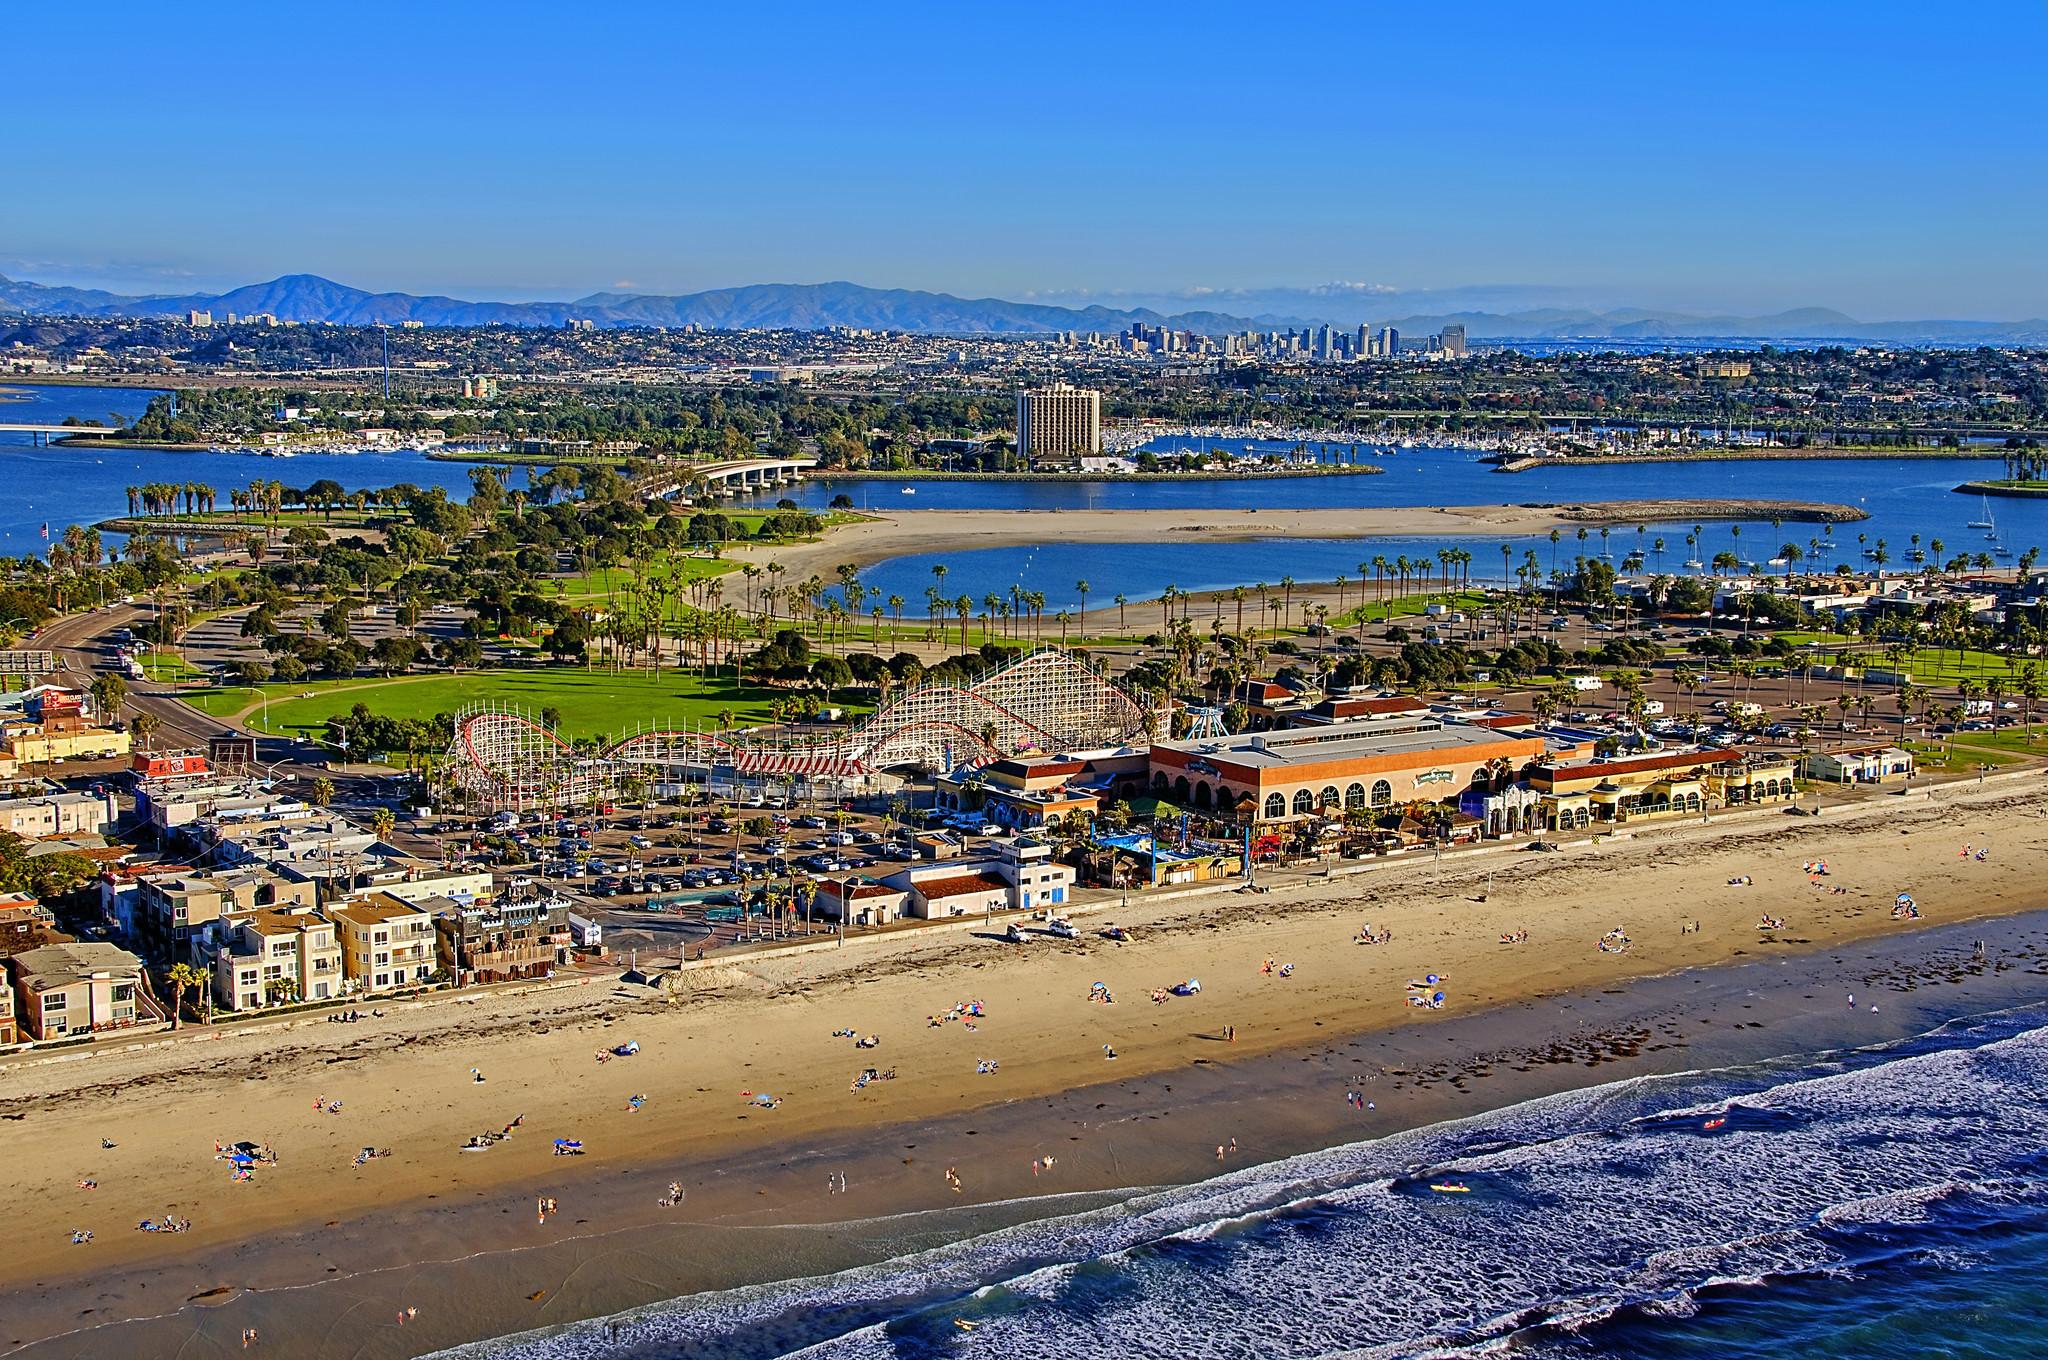 South Mission Beach Park San Diego